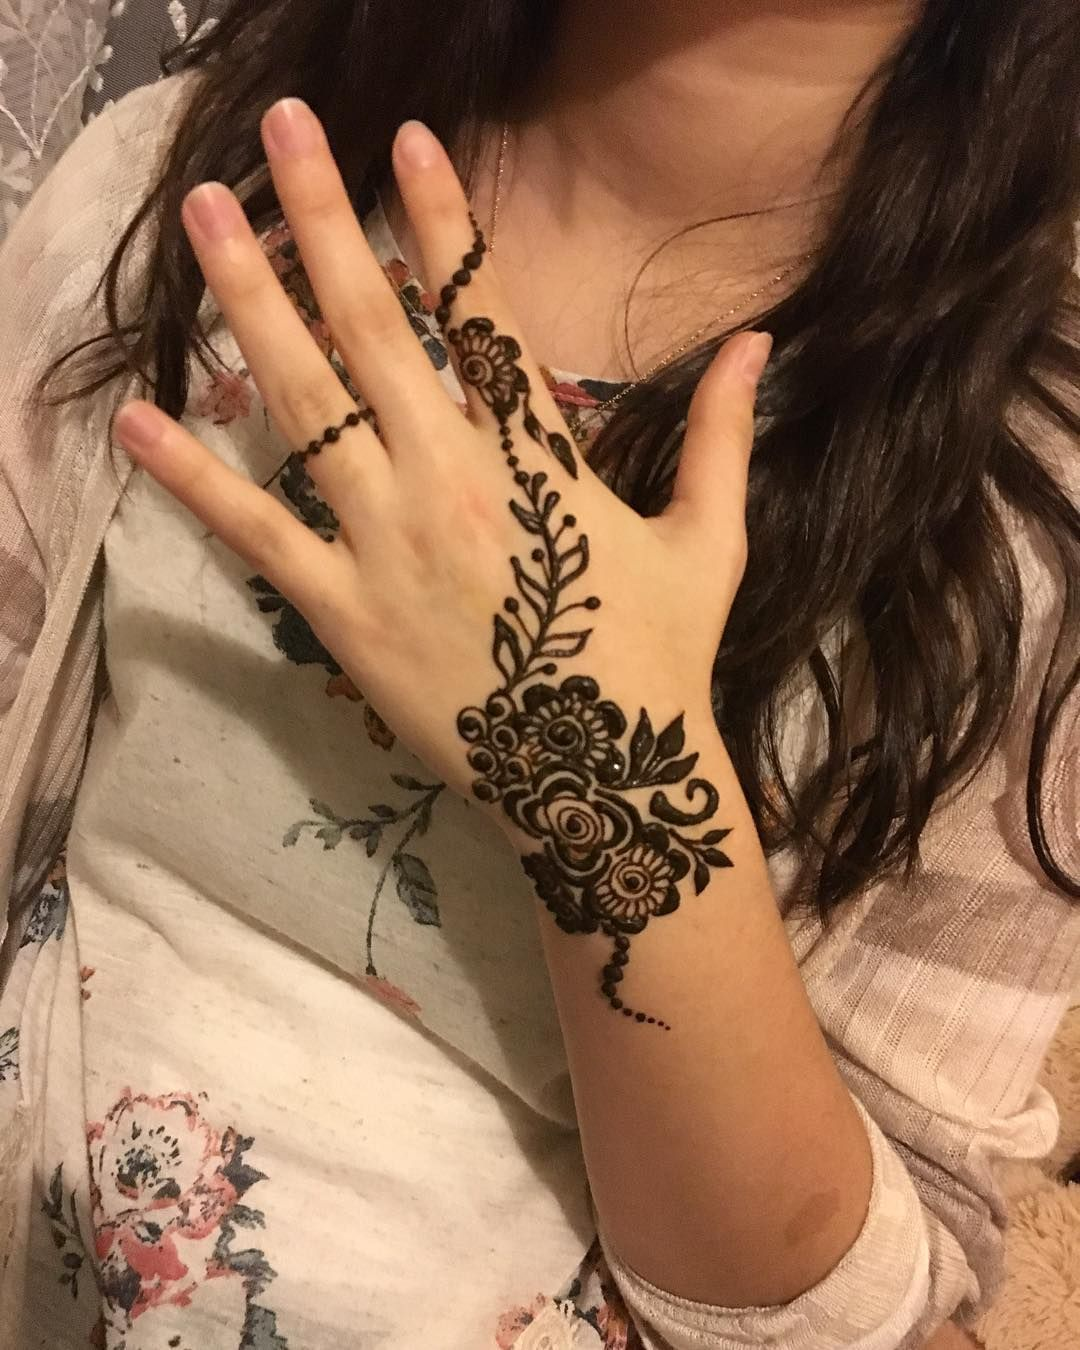 Design Of The Day Hennadesign Hennaart Henna Hennatattoo Hennadesigns Hennadesig Henna Tattoo Designs Henna Designs Easy Mehndi Designs For Fingers